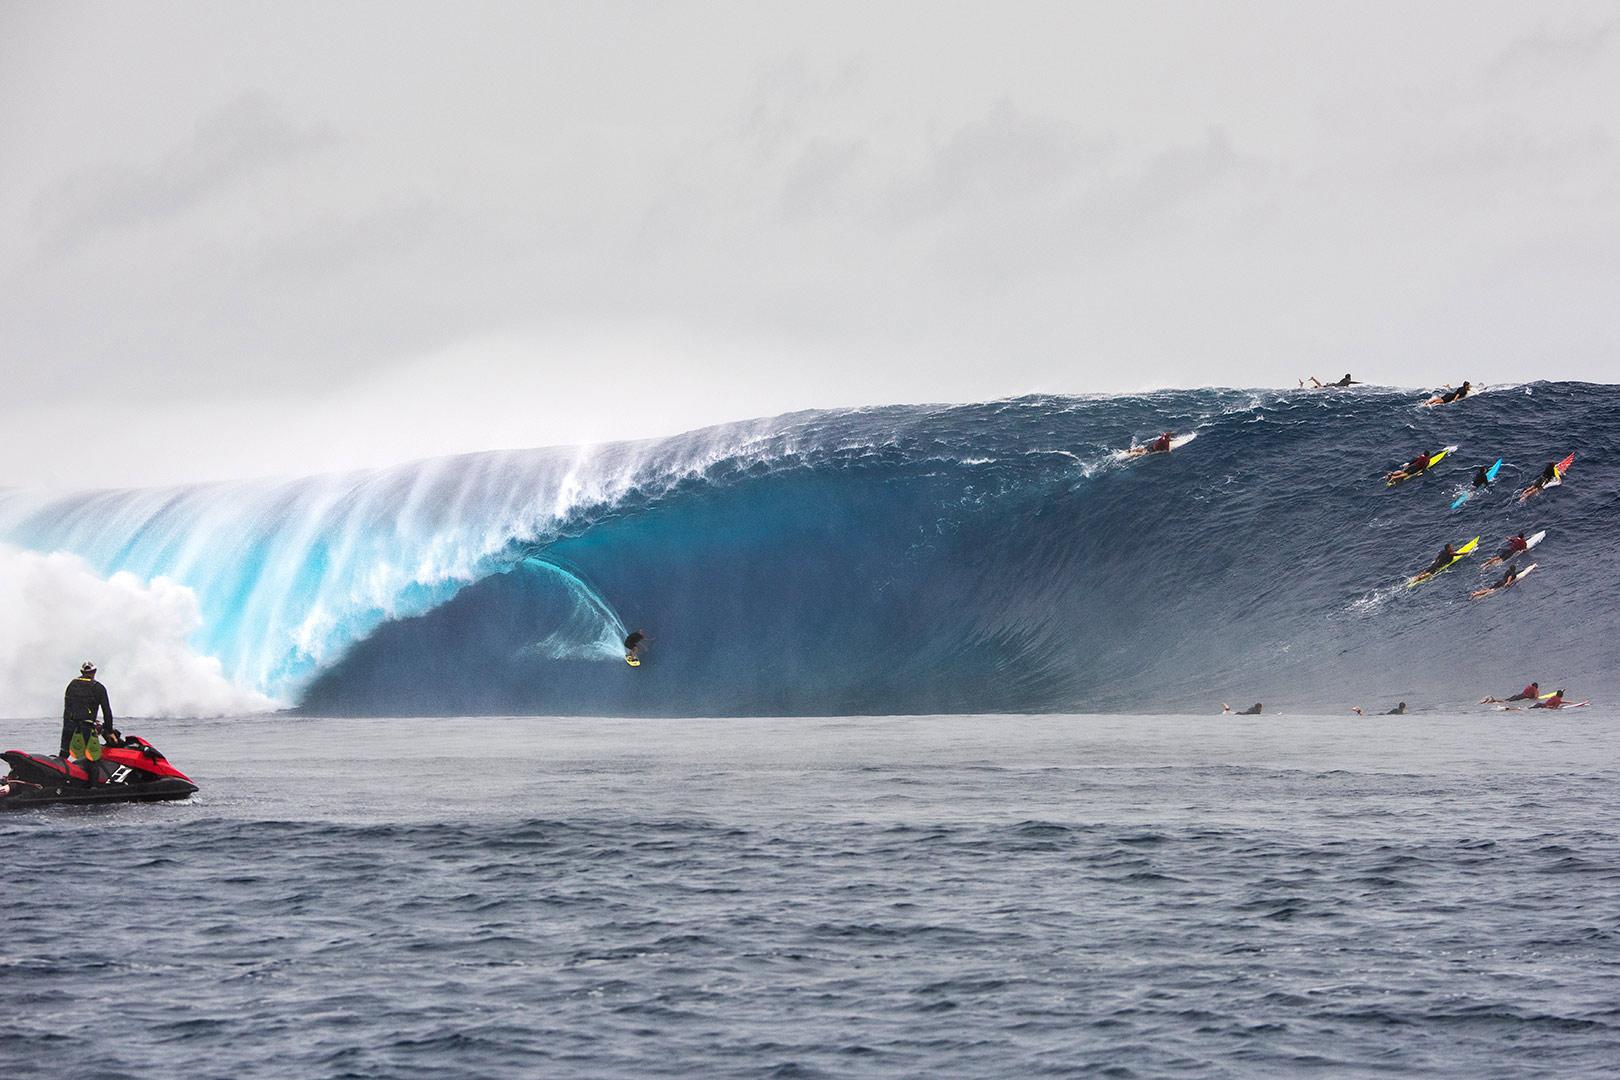 SURFING HISTORY: The biggest wave ever ridden at Cloudbreak, FIJI - Ramon Navarro.